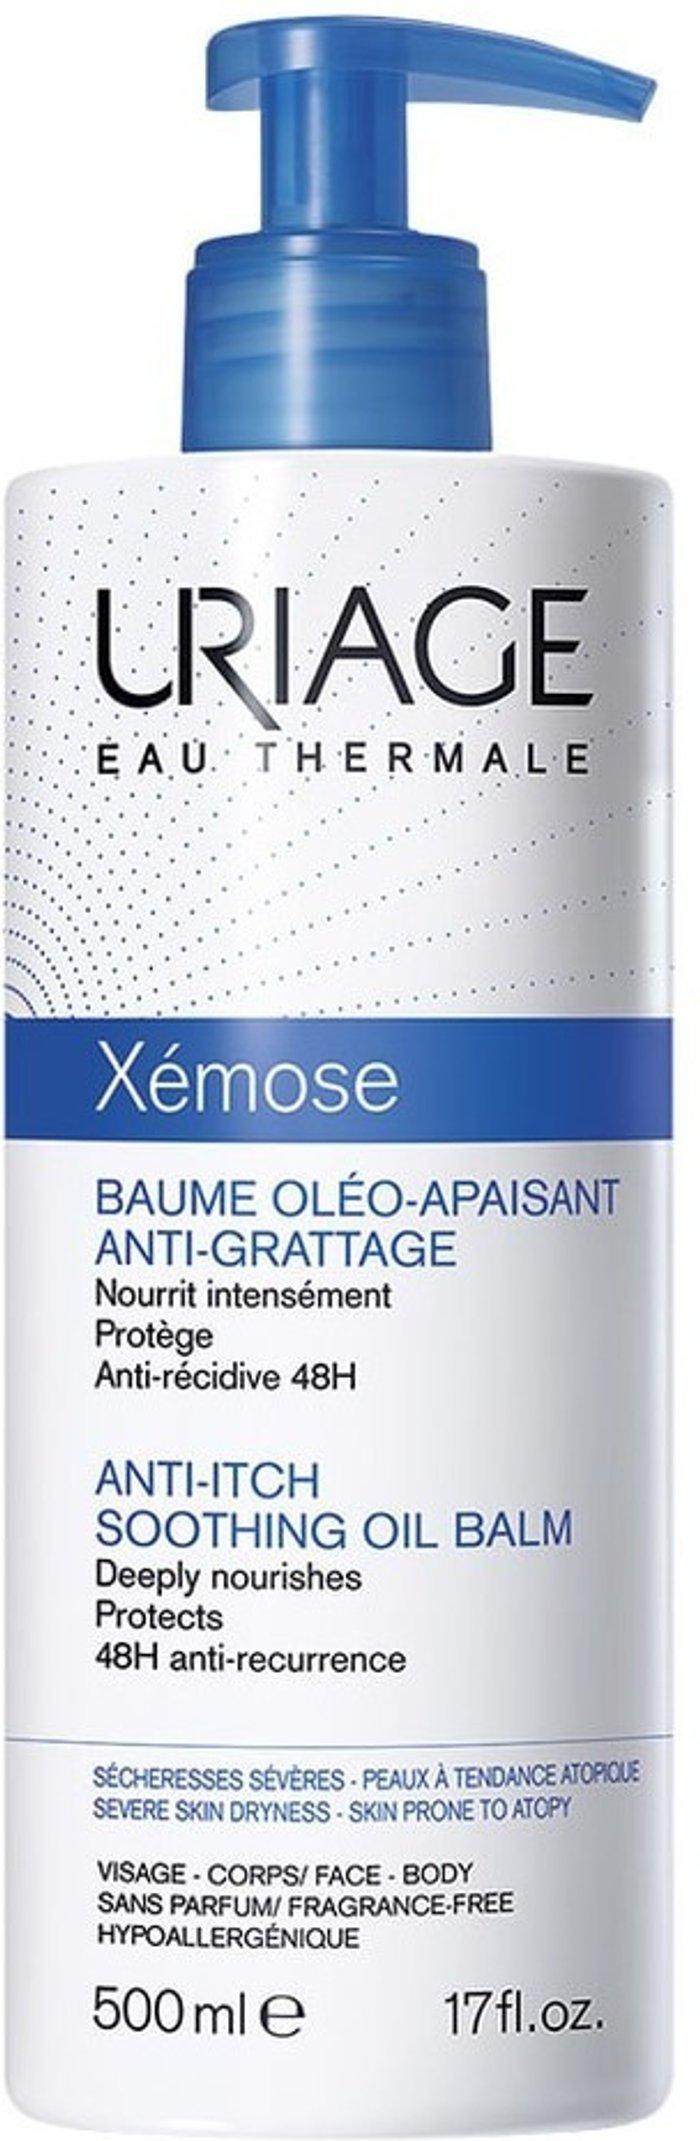 Uriage Uriage Xemose Anti-Itch Soothing Oil Balm (500ml)